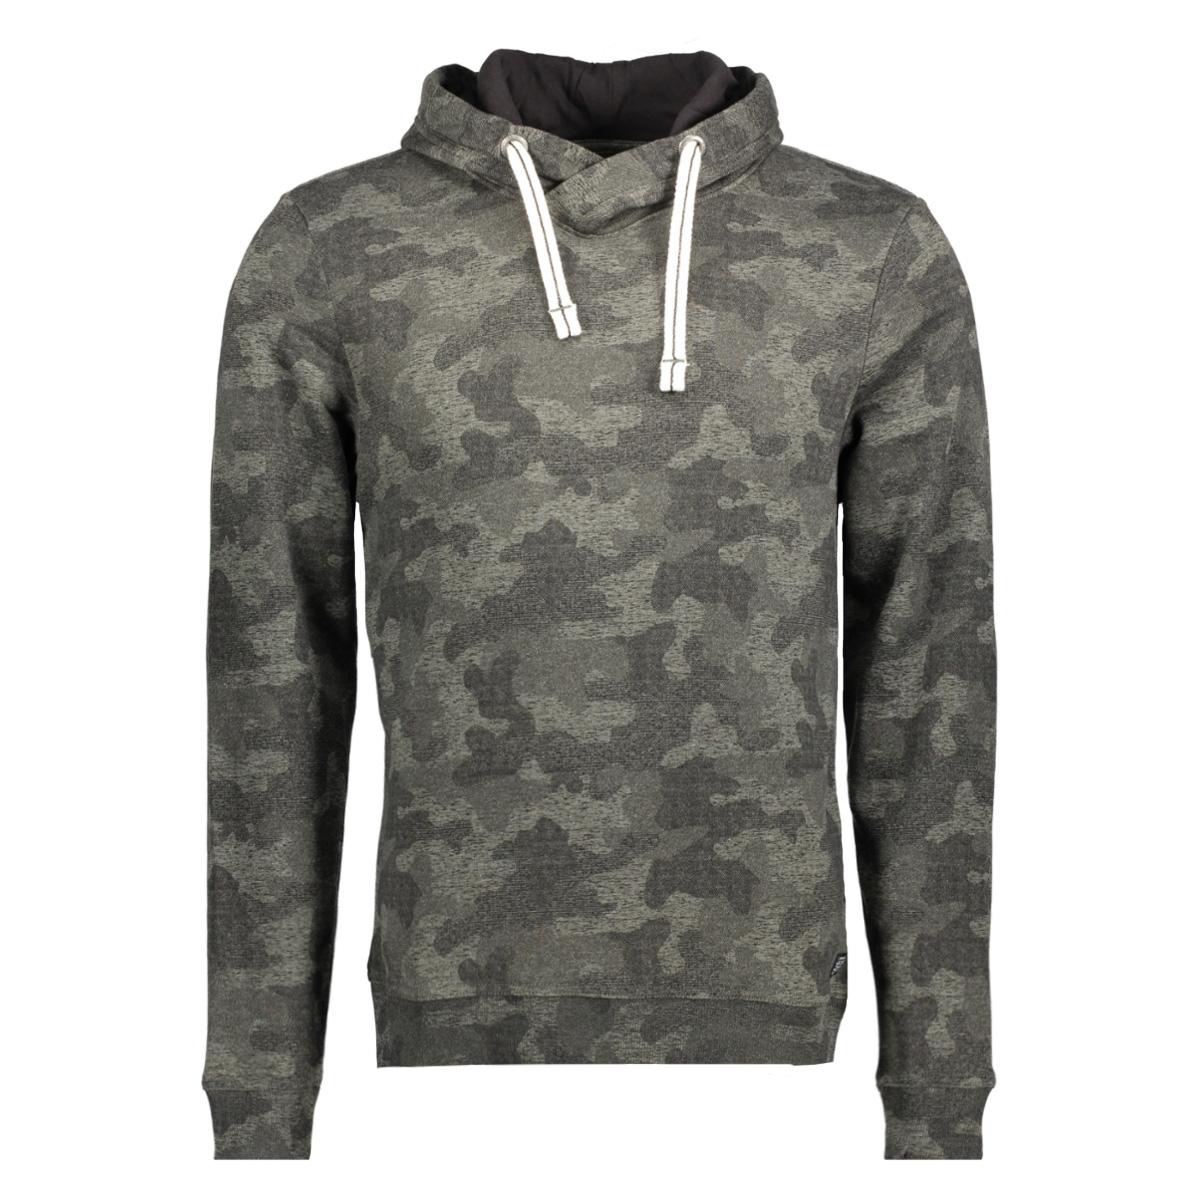 2531633.00.10 tom tailor sweater 7813